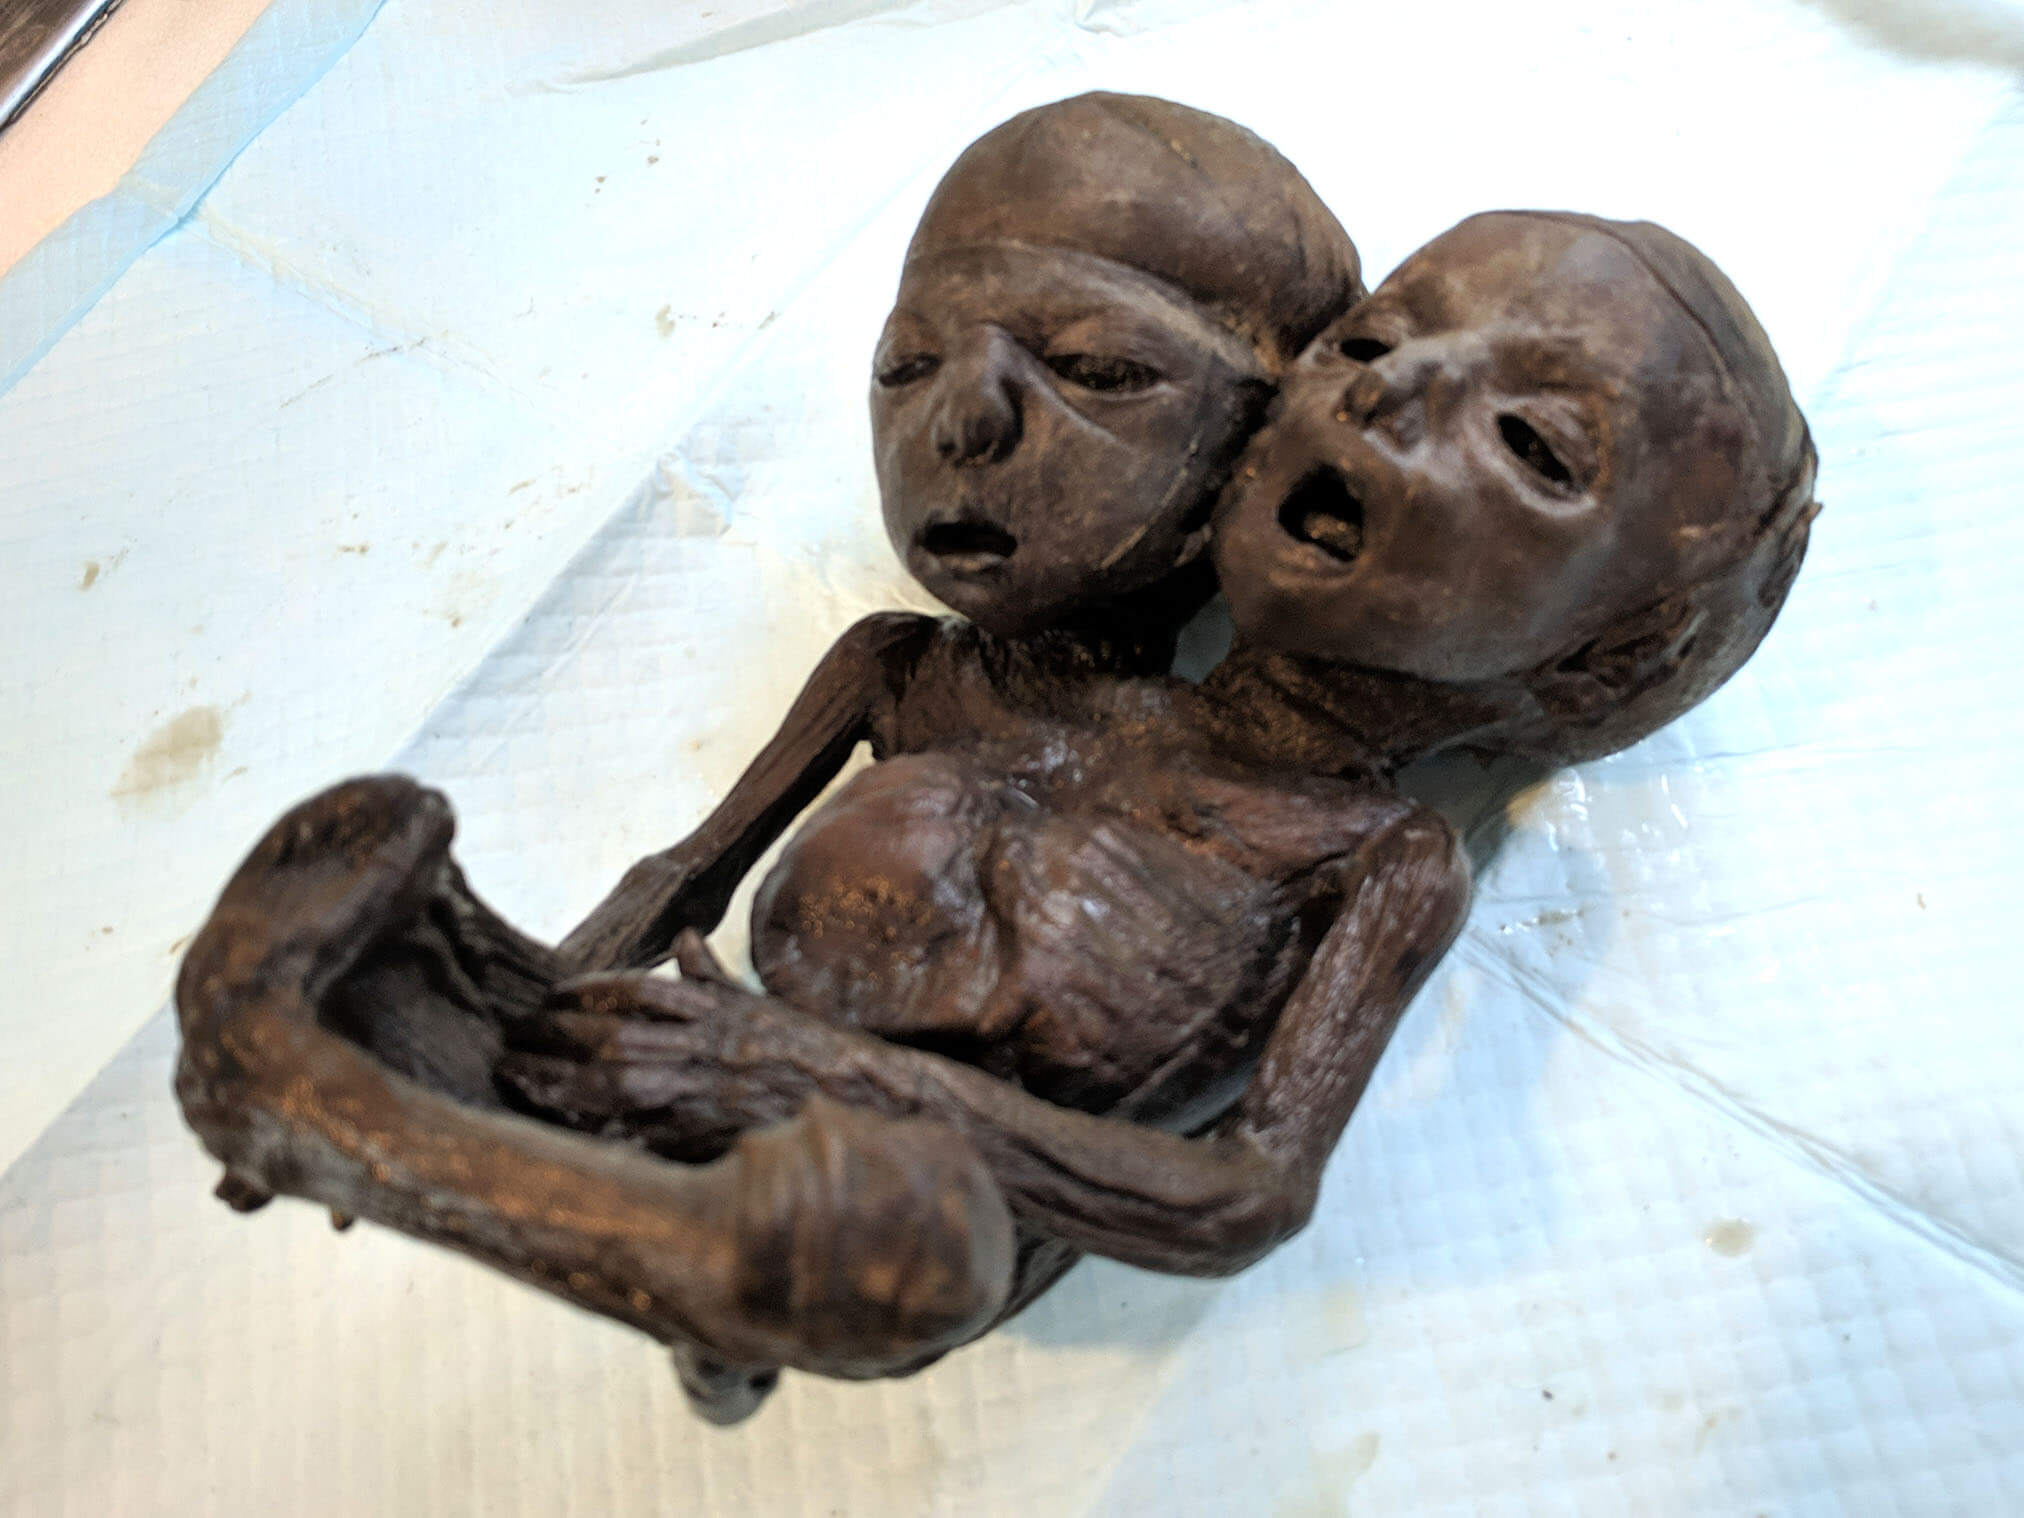 Two headed baby (1).jpg